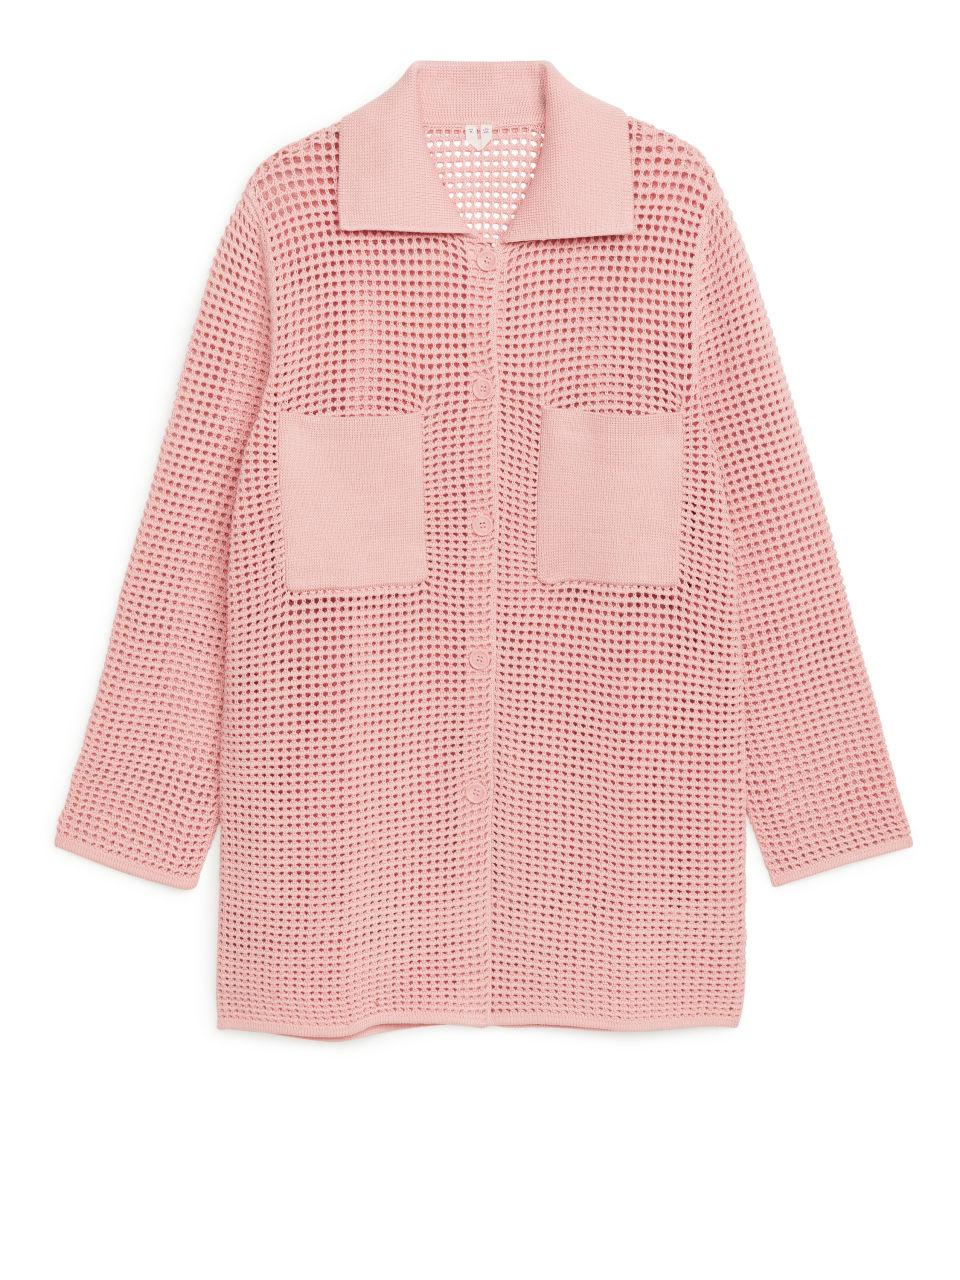 Crochet Cardigan - Pink